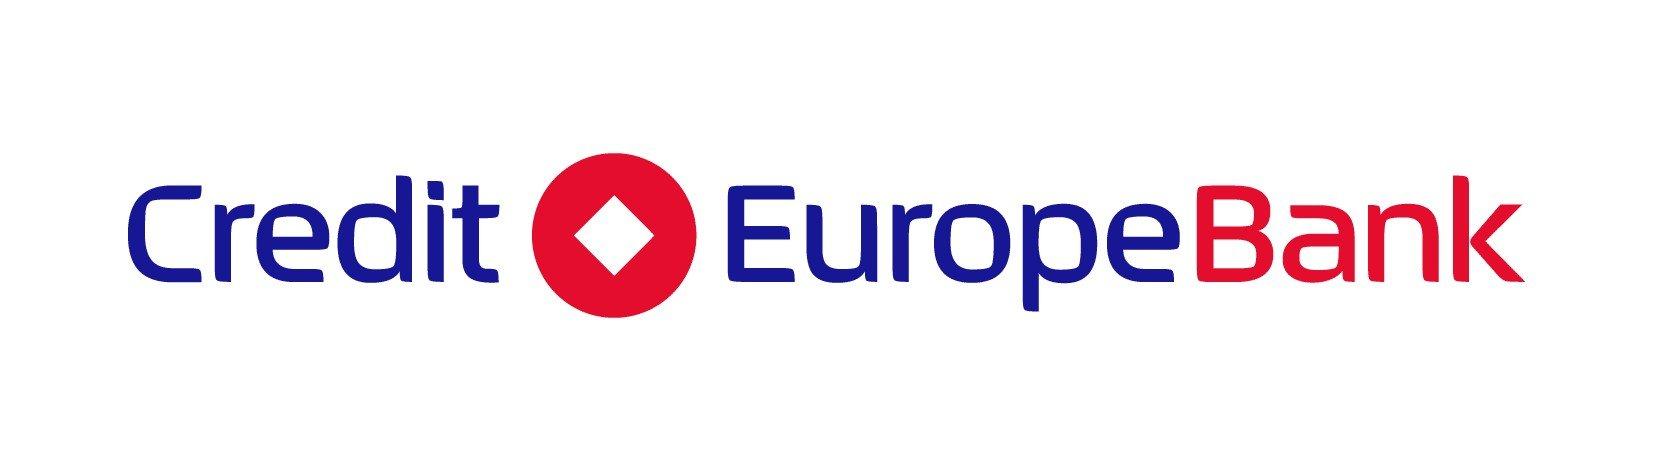 Extras online credit europe bank